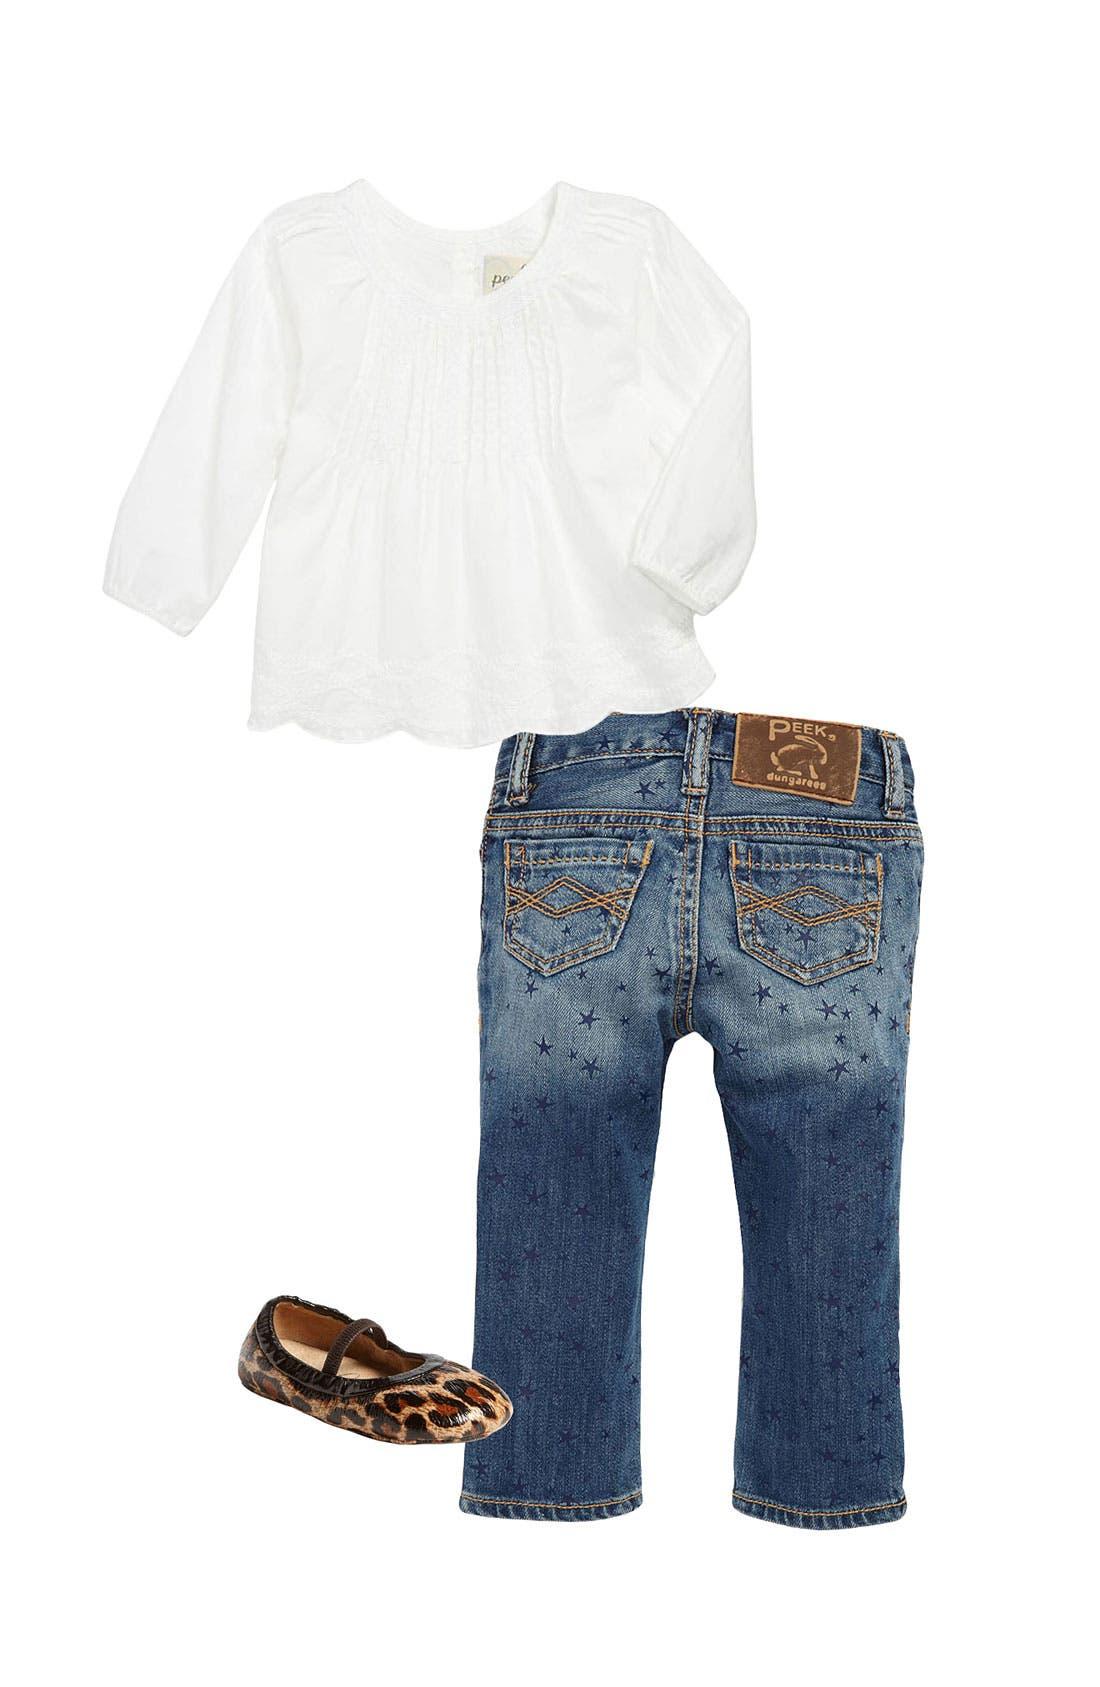 Alternate Image 1 Selected - Peek Top, Skinny Jeans & Crib Shoe (Infant)